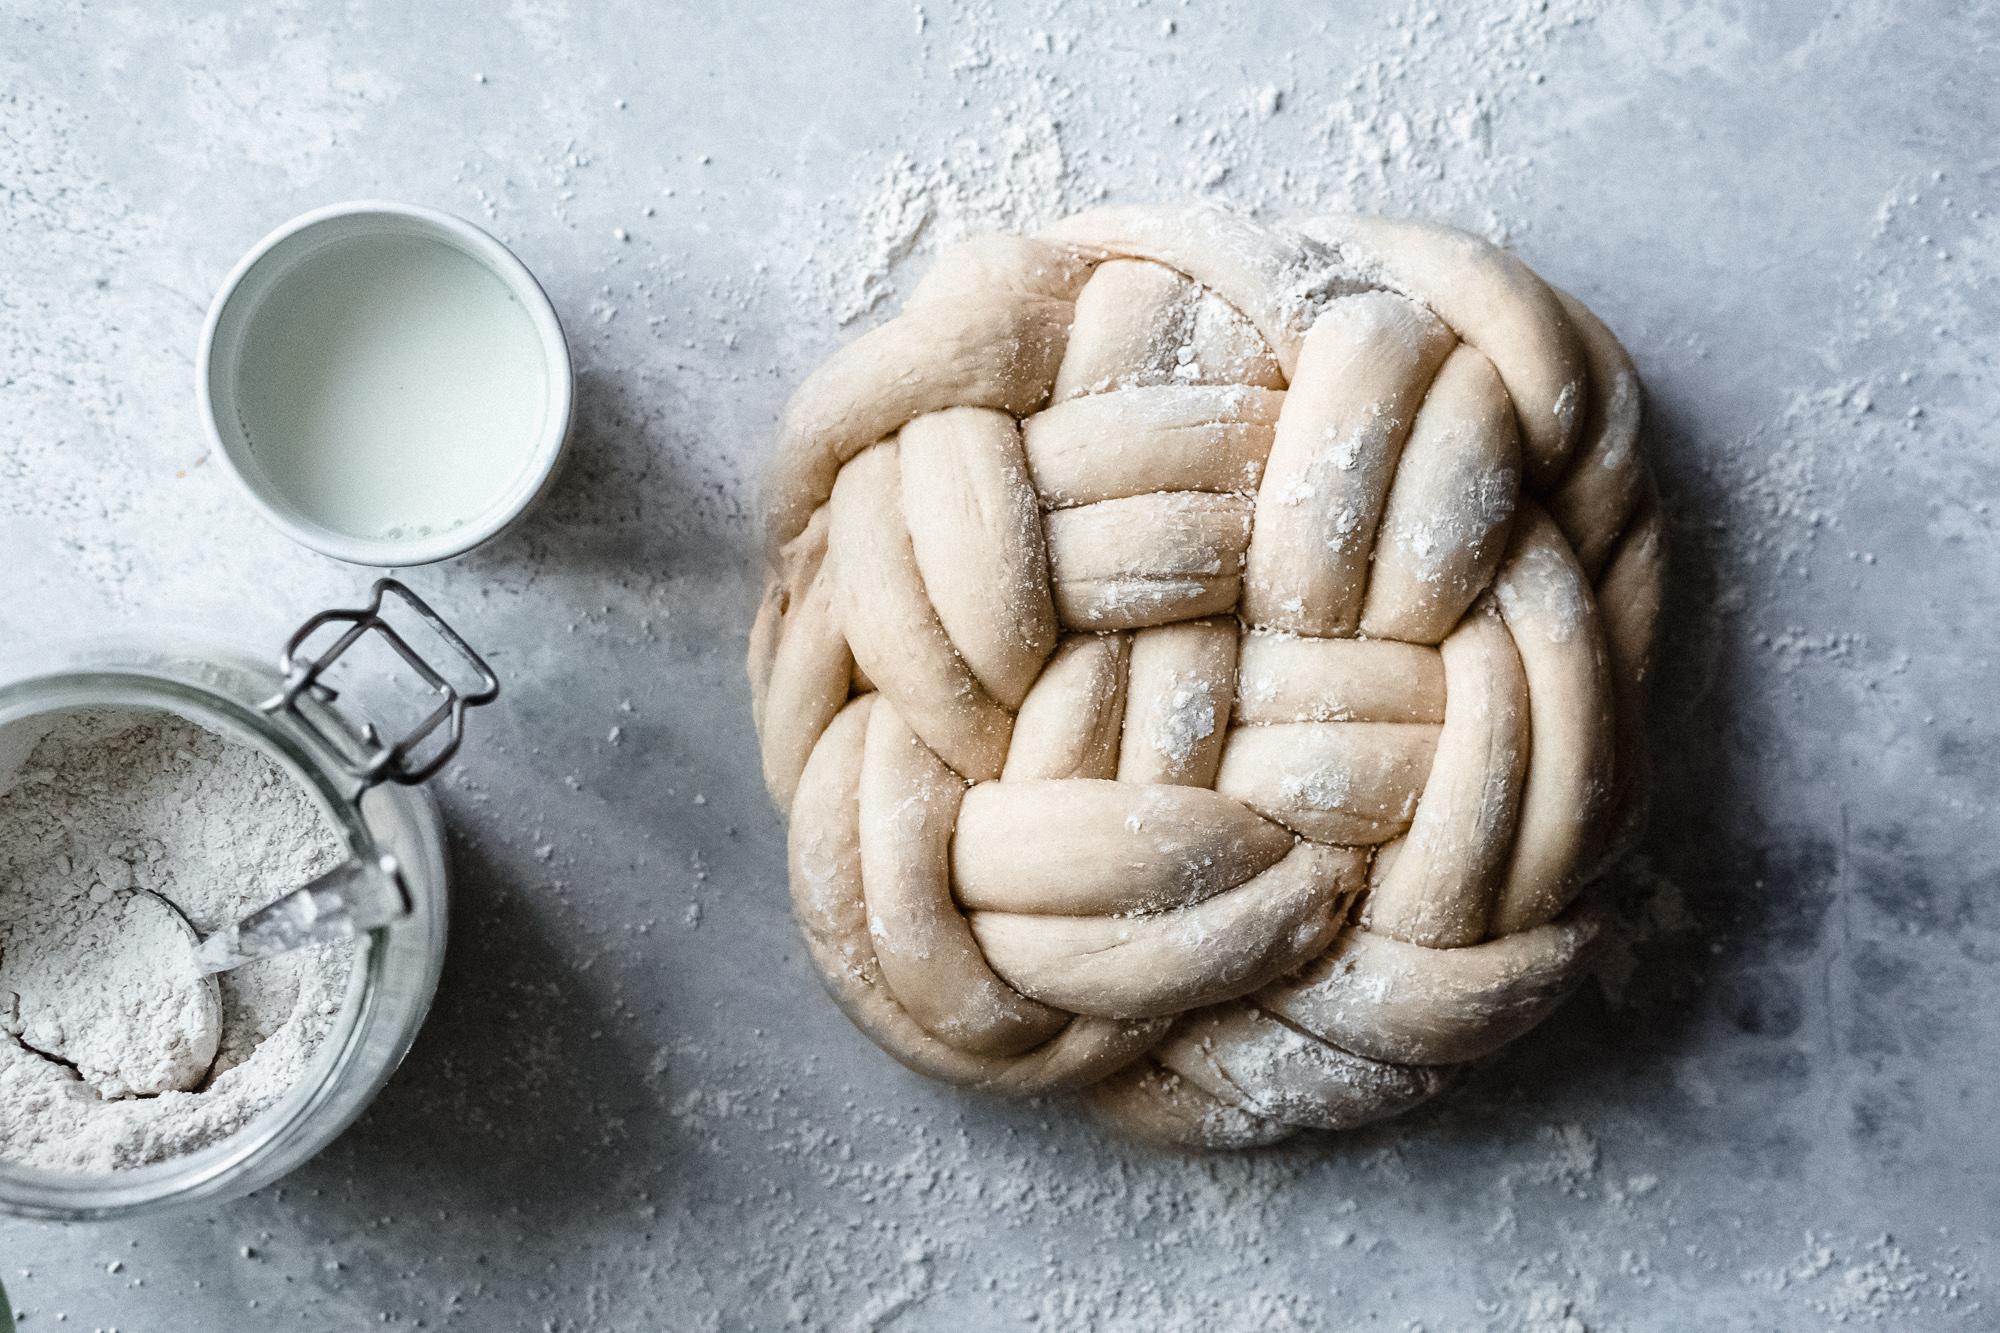 Foodfotografie © Katharina Traub